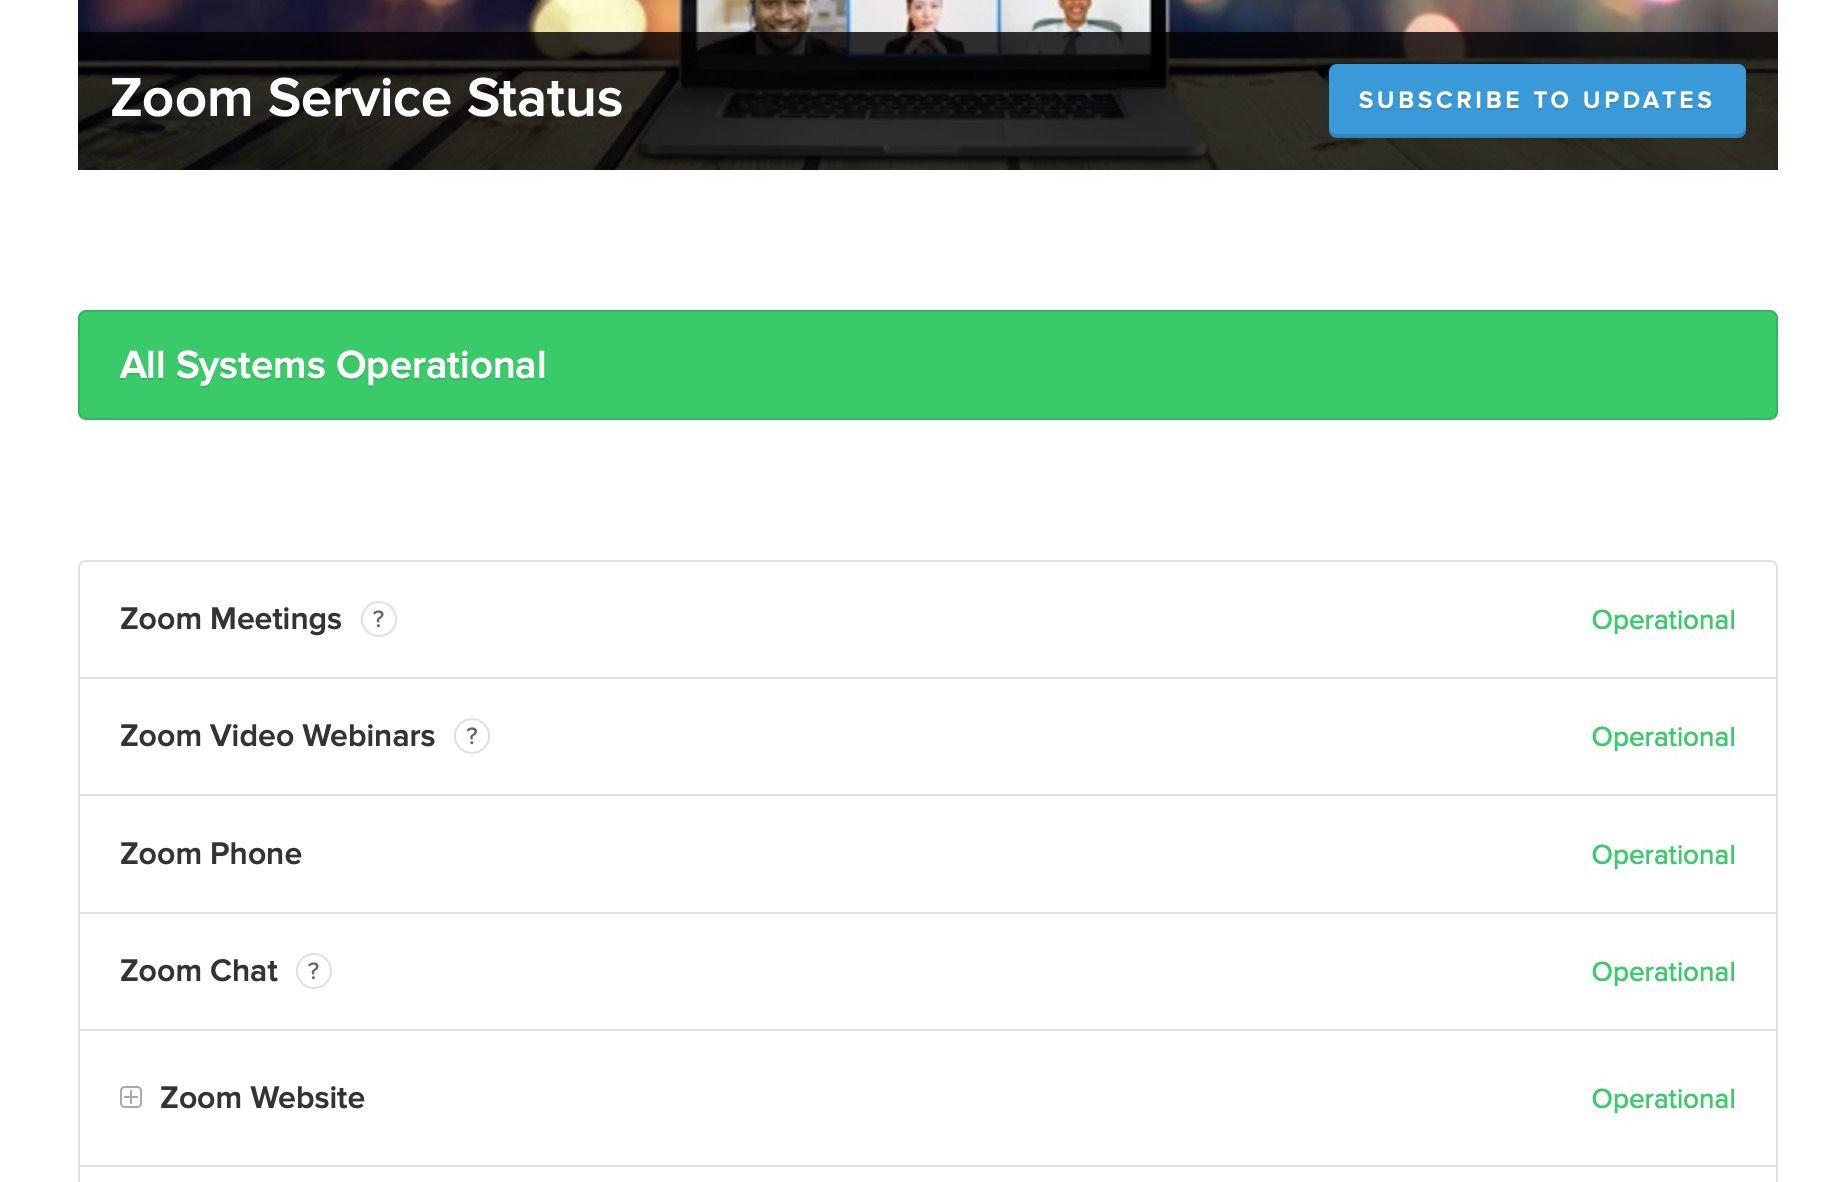 Zoom Service Status website